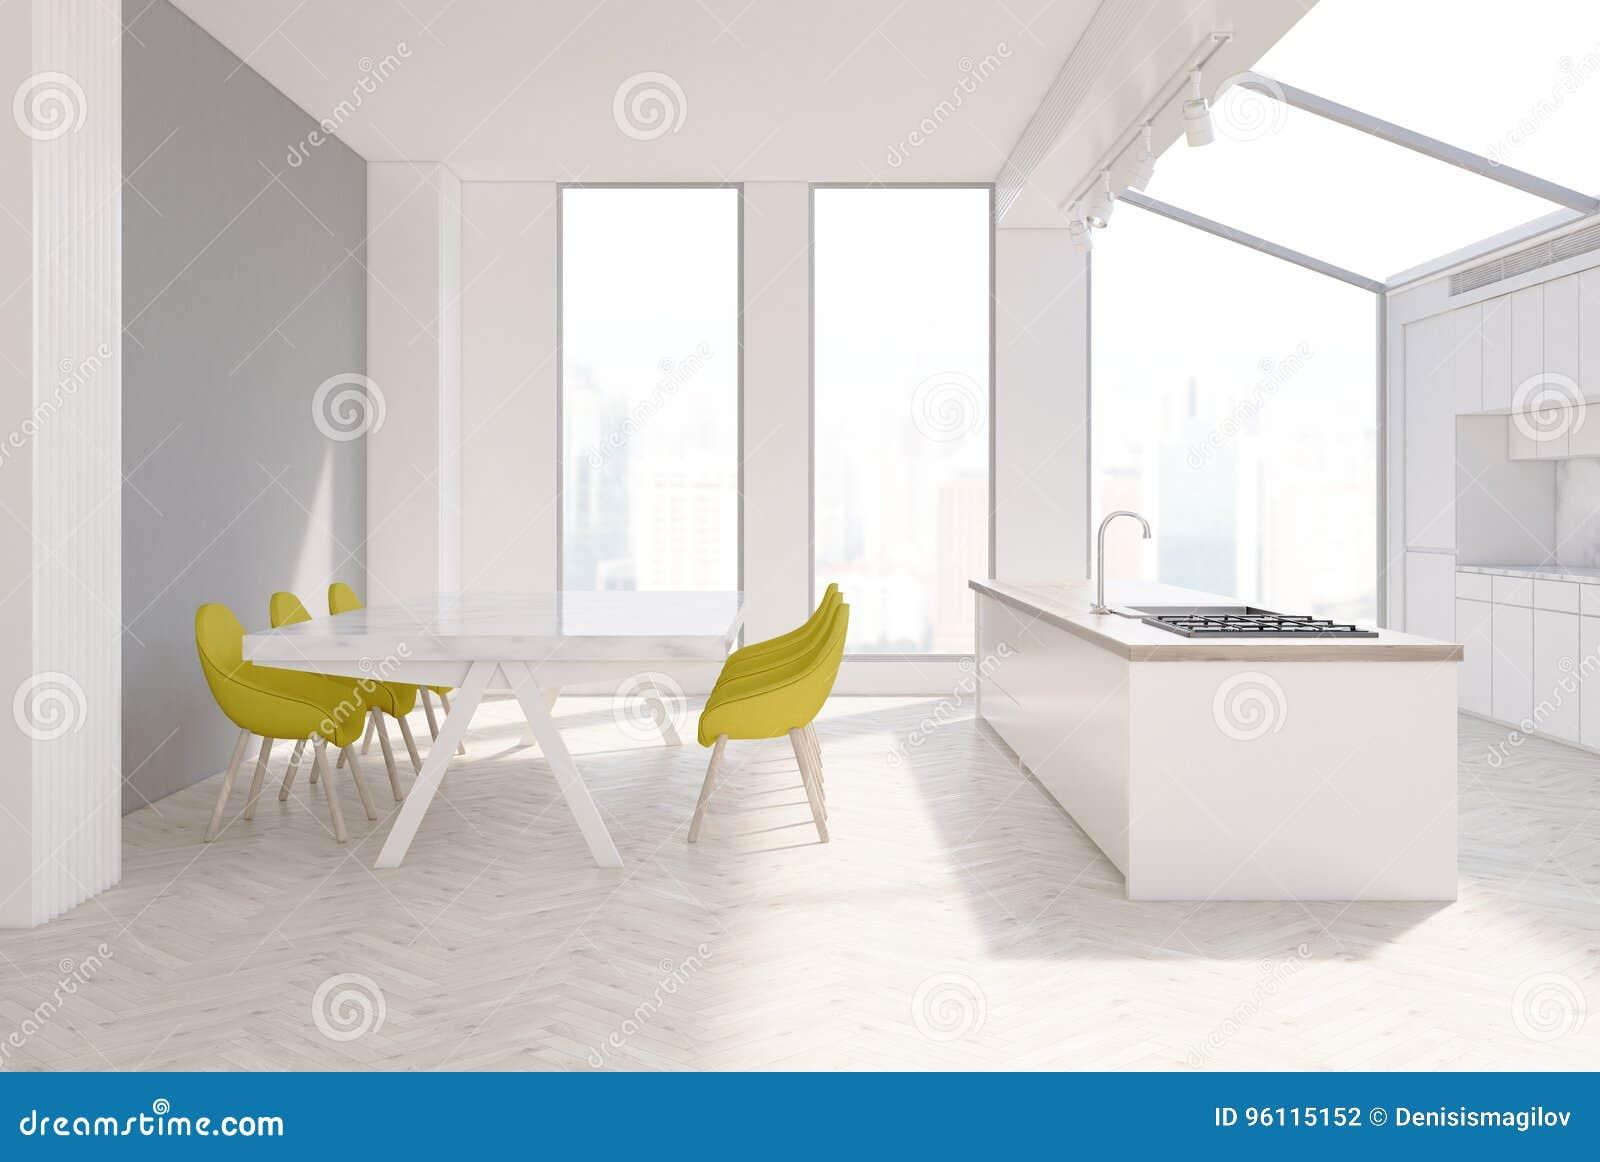 Sedie Gialle Da Cucina.Cucina Grigia Interna Sedie Gialle Illustrazione Di Stock